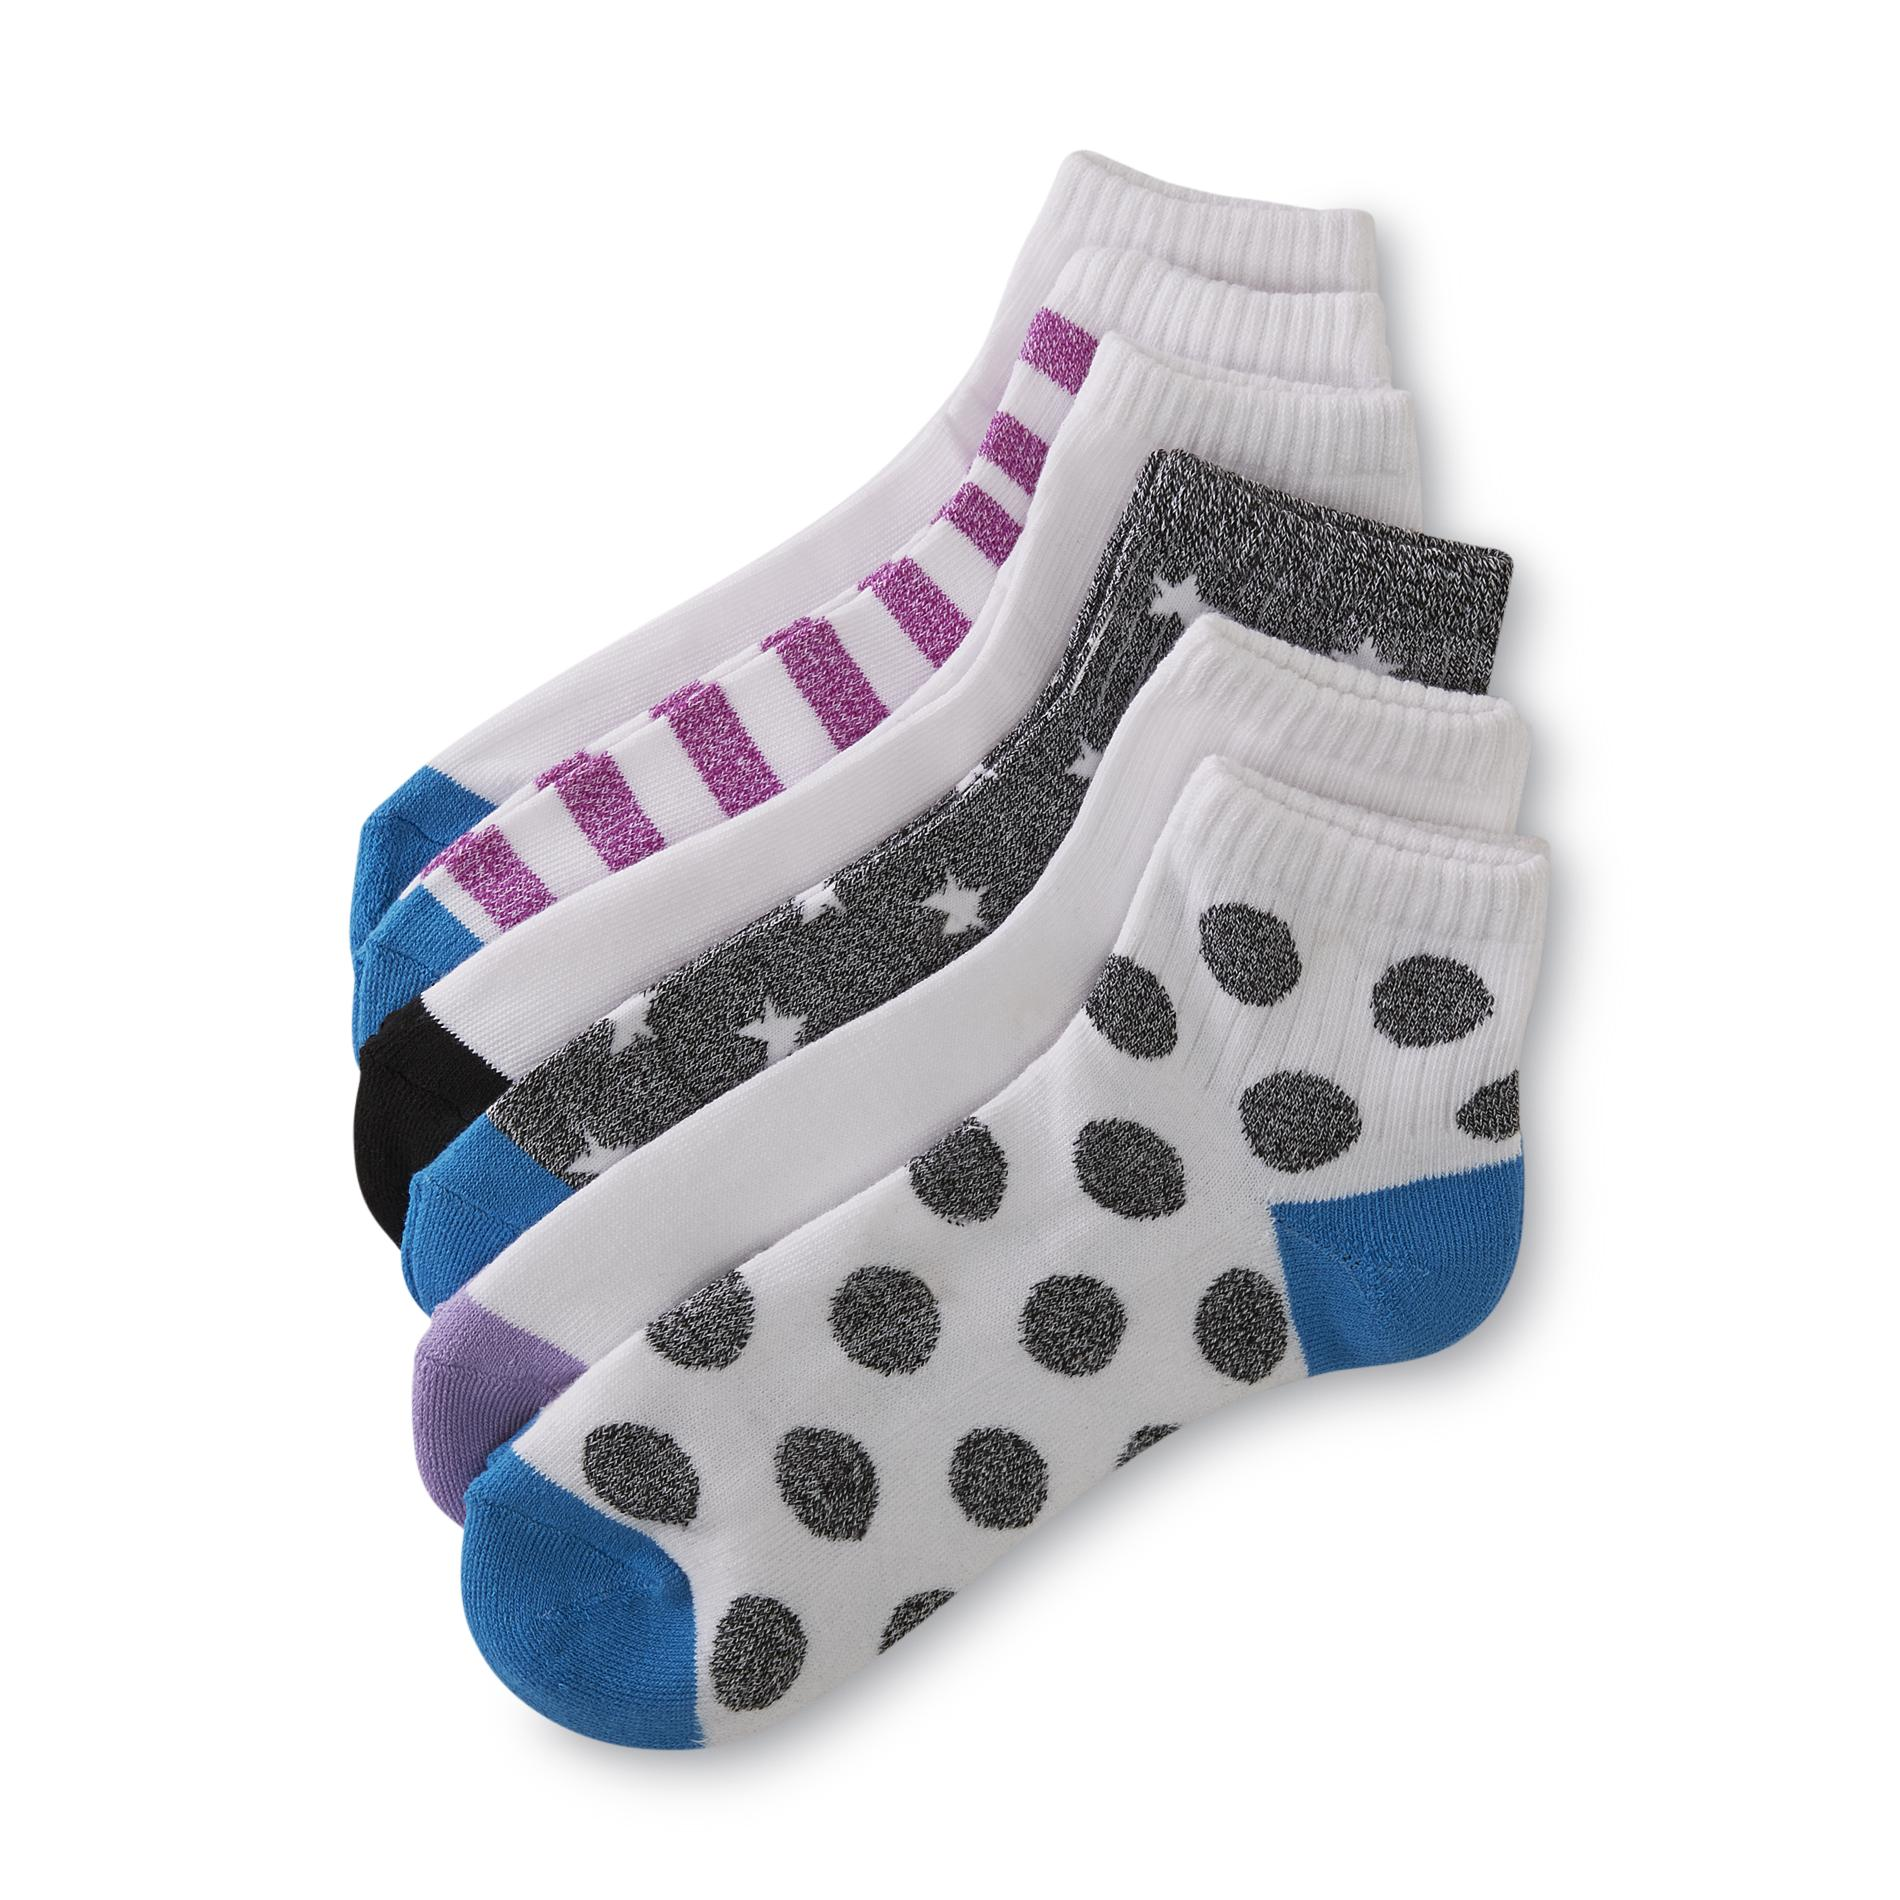 Joe Boxer Women's 6-Pairs Quarter Socks